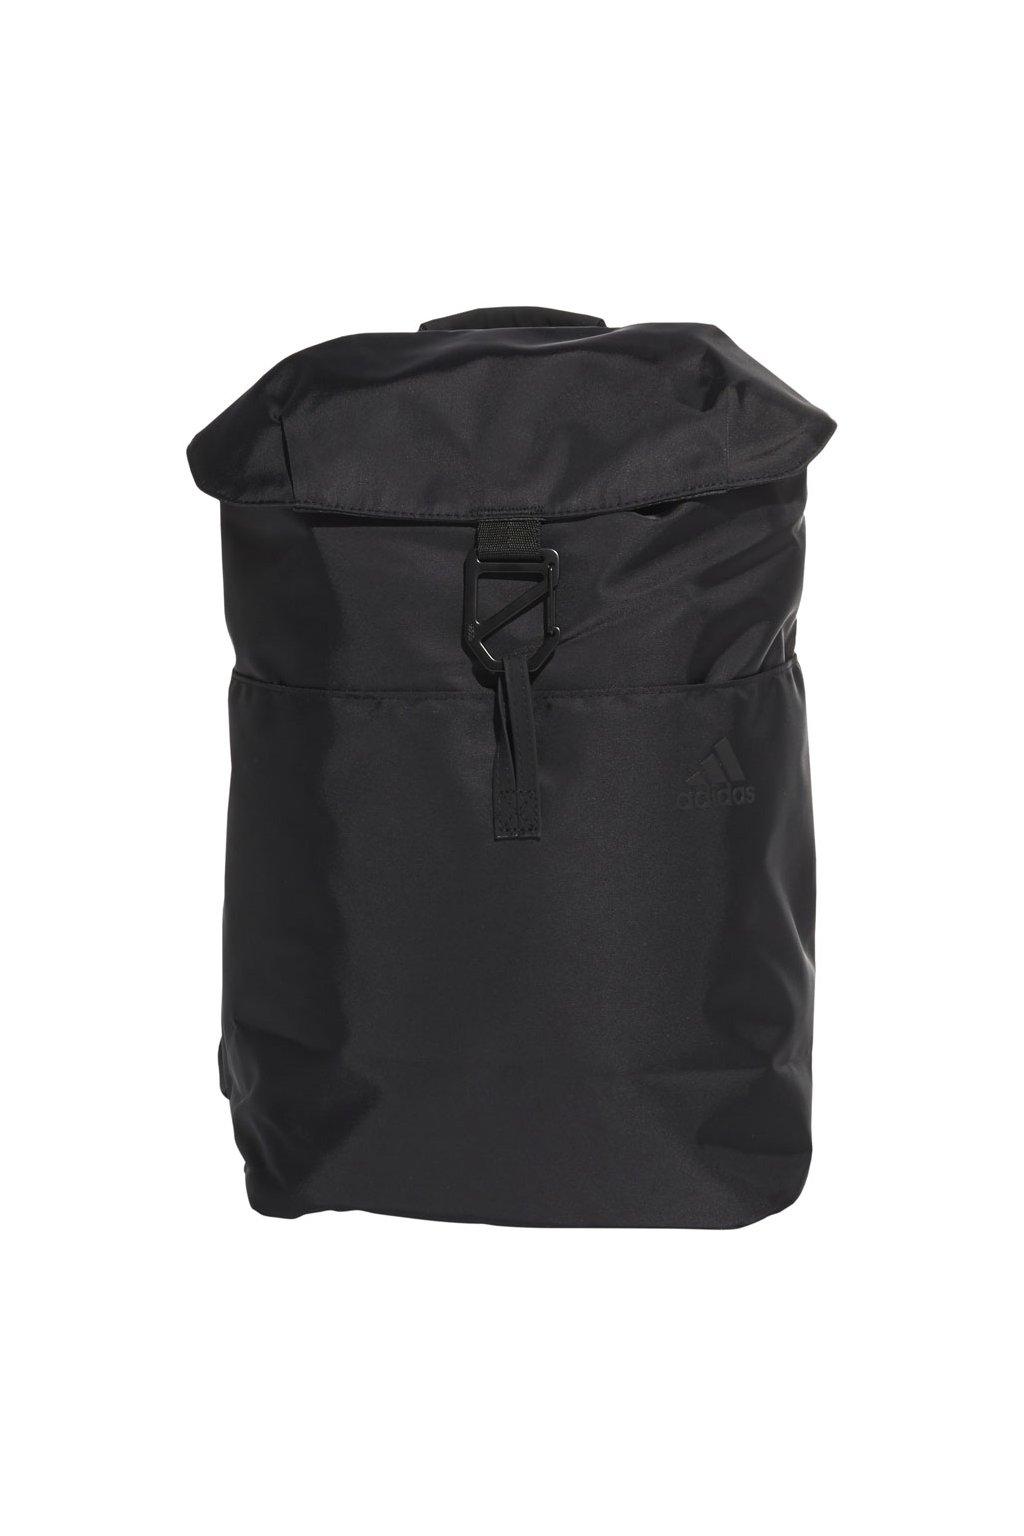 Batoh Adidas Training ID Flap BP čierny DT4066